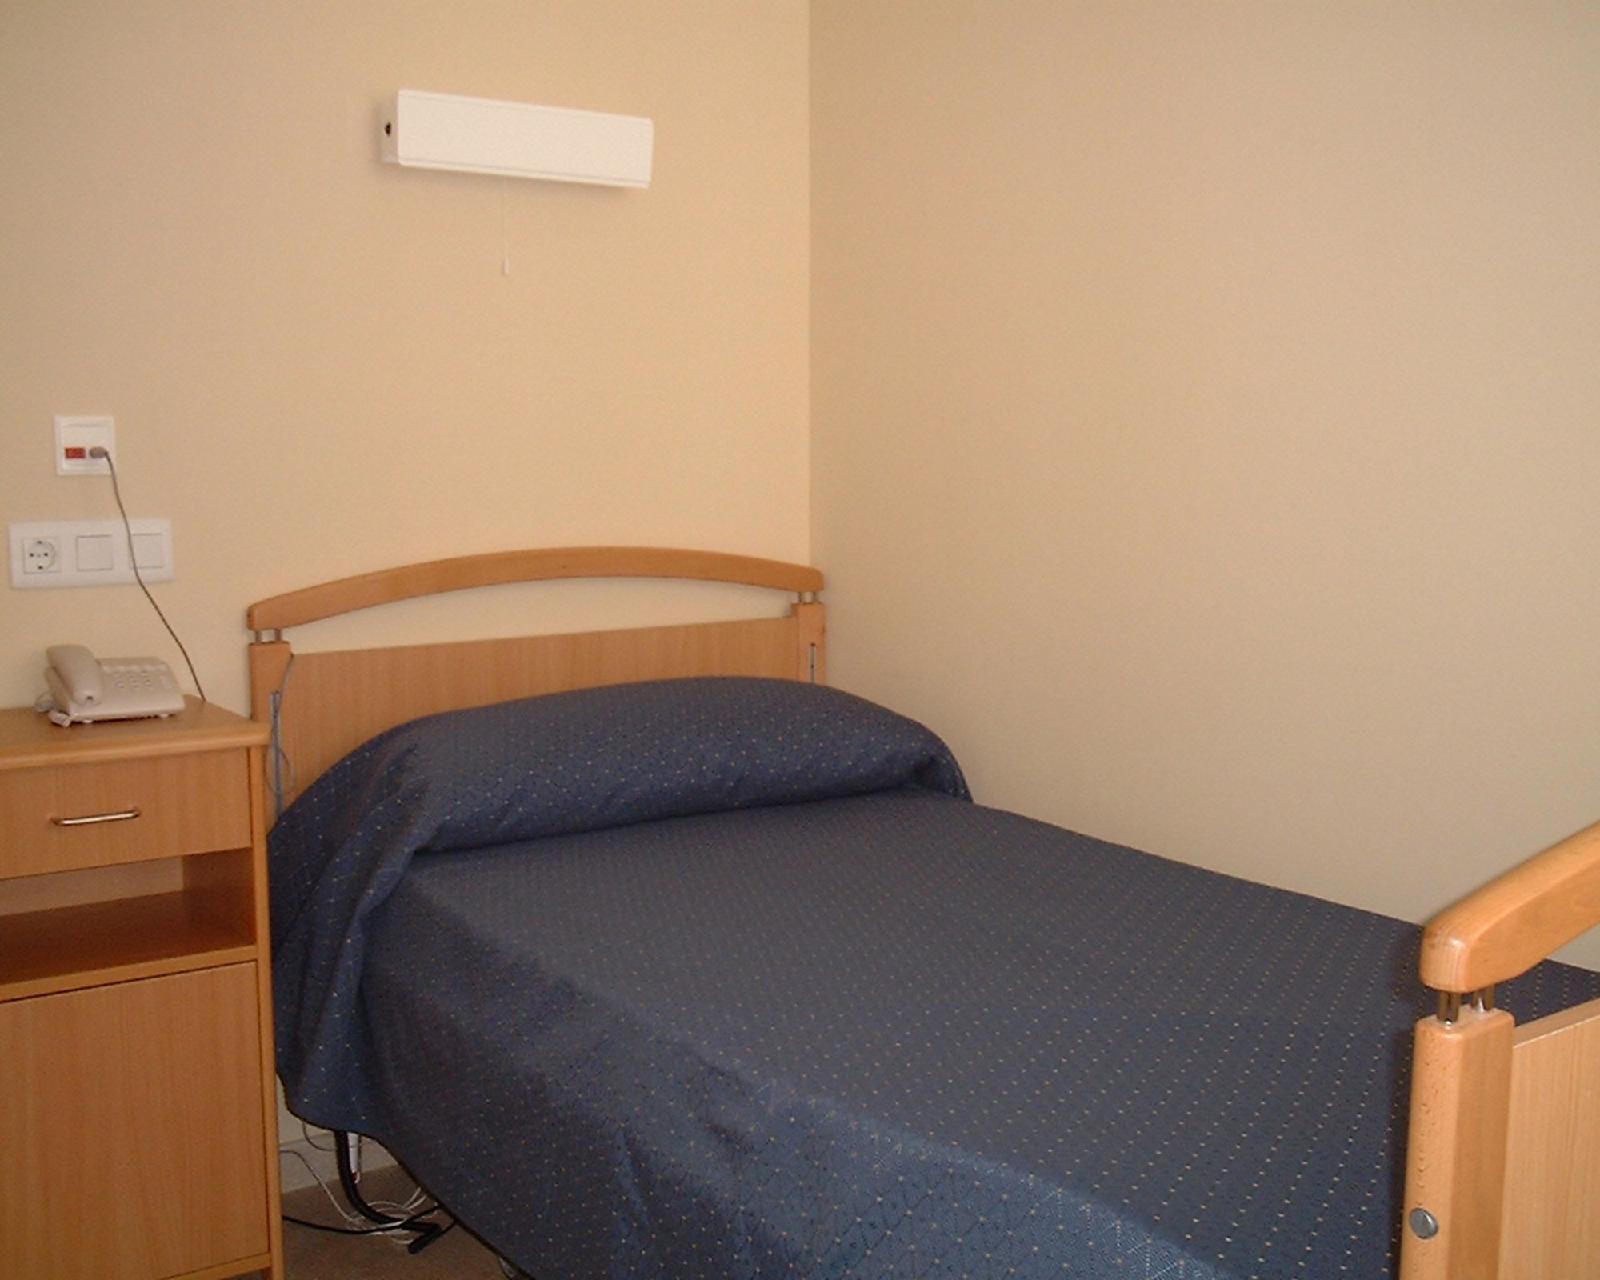 residencia ilerda habitacion individual